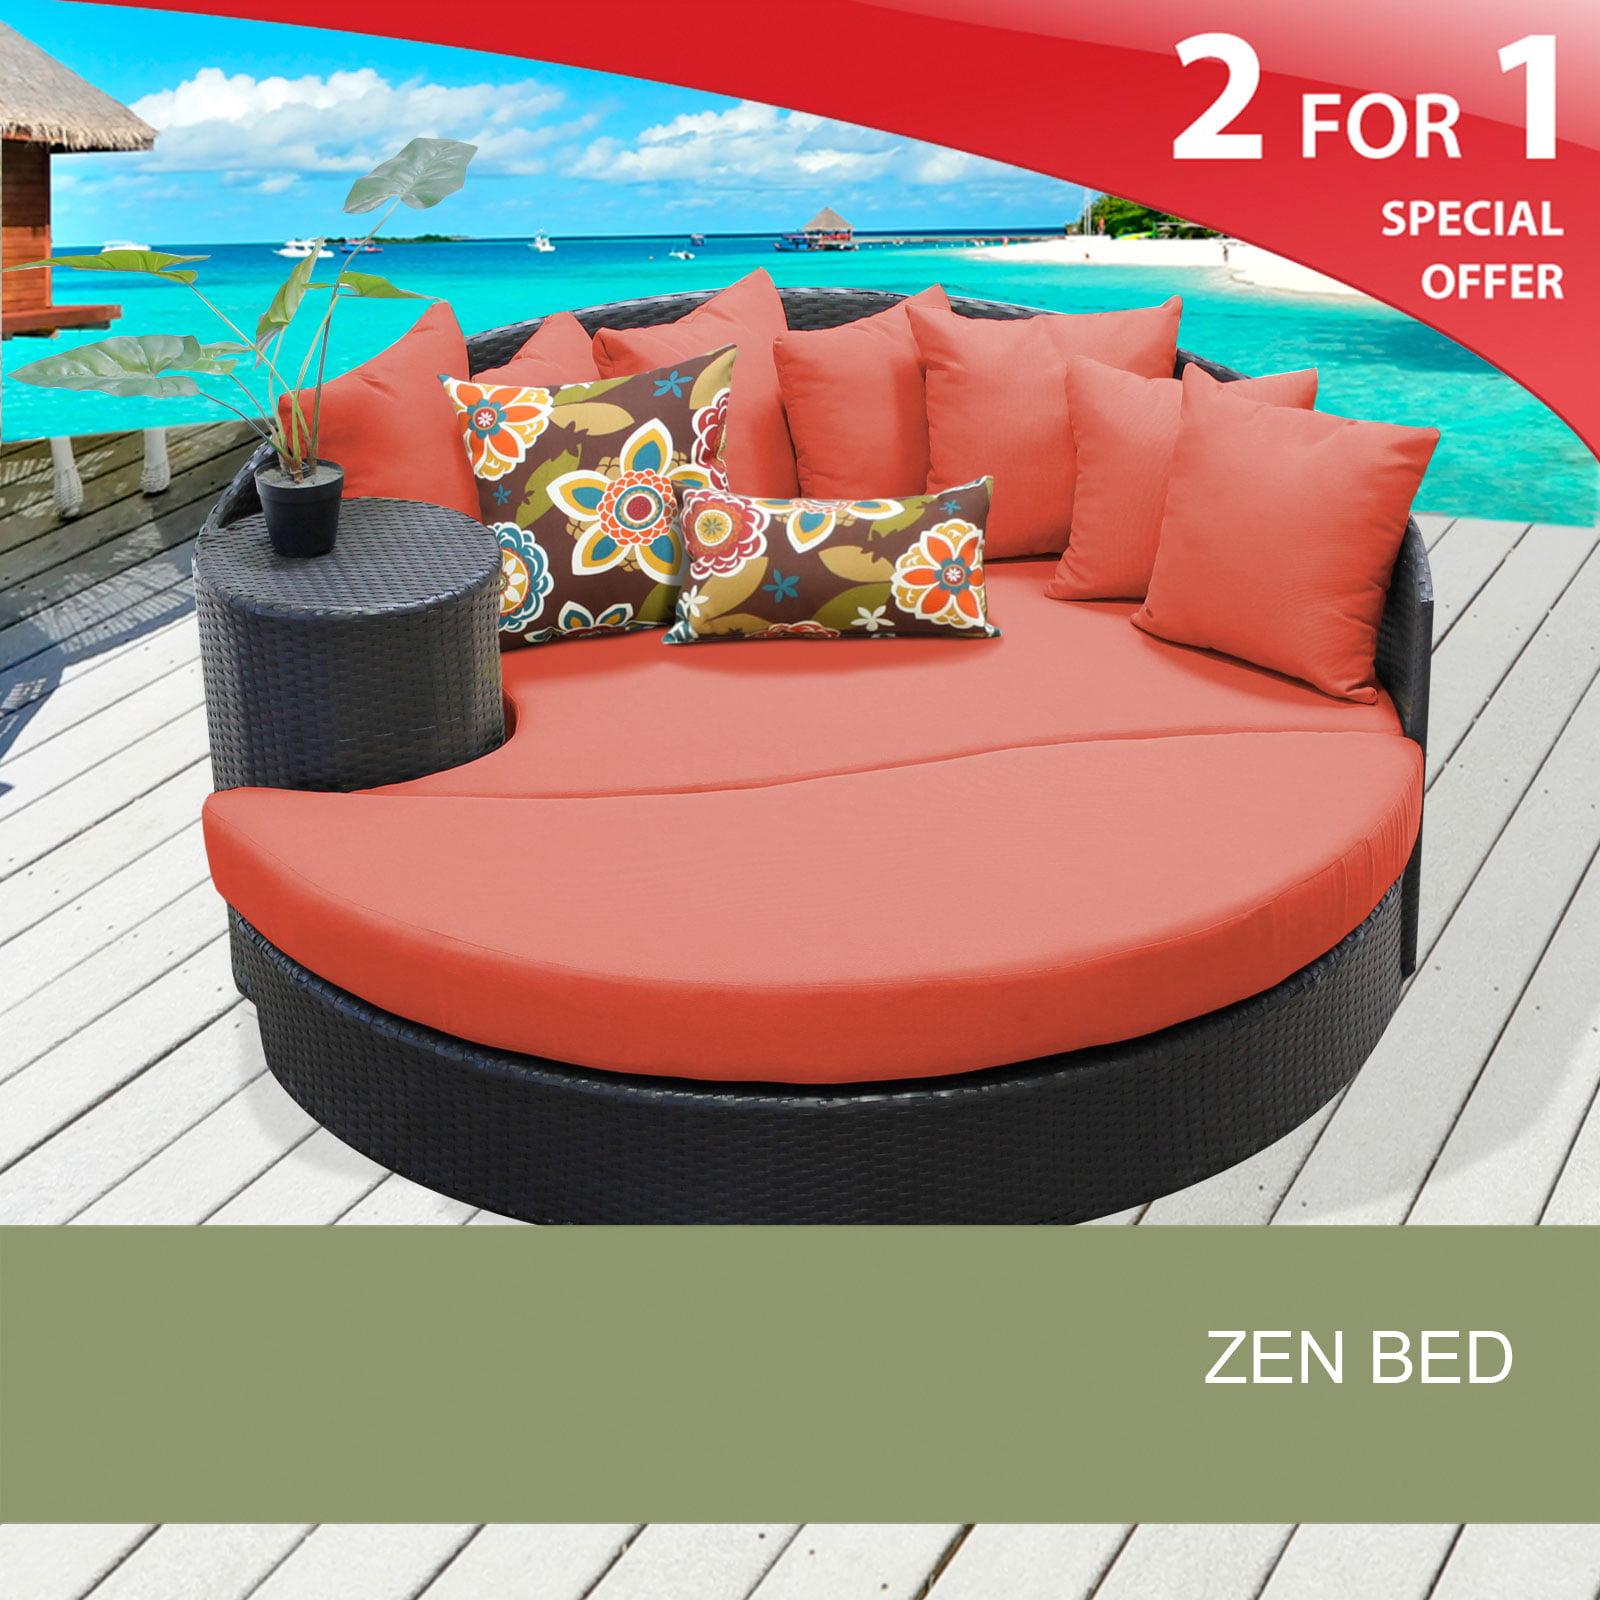 Sensational Zen Circular Sun Bed Outdoor Wicker Patio Furniture Download Free Architecture Designs Embacsunscenecom